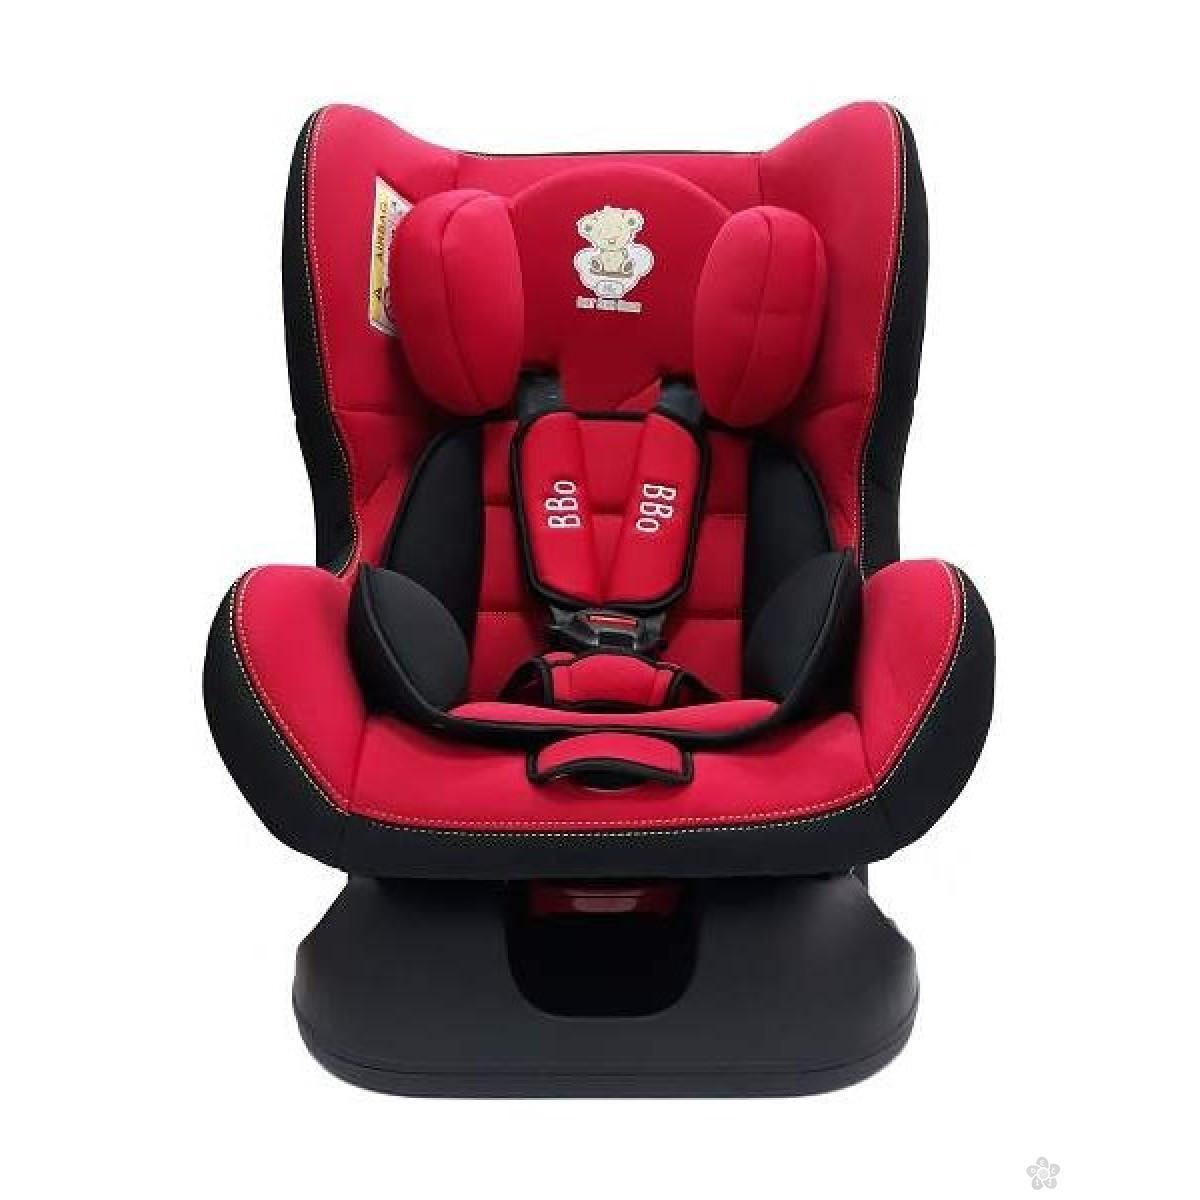 Autosedište BBO Rider crveno 0-18kg